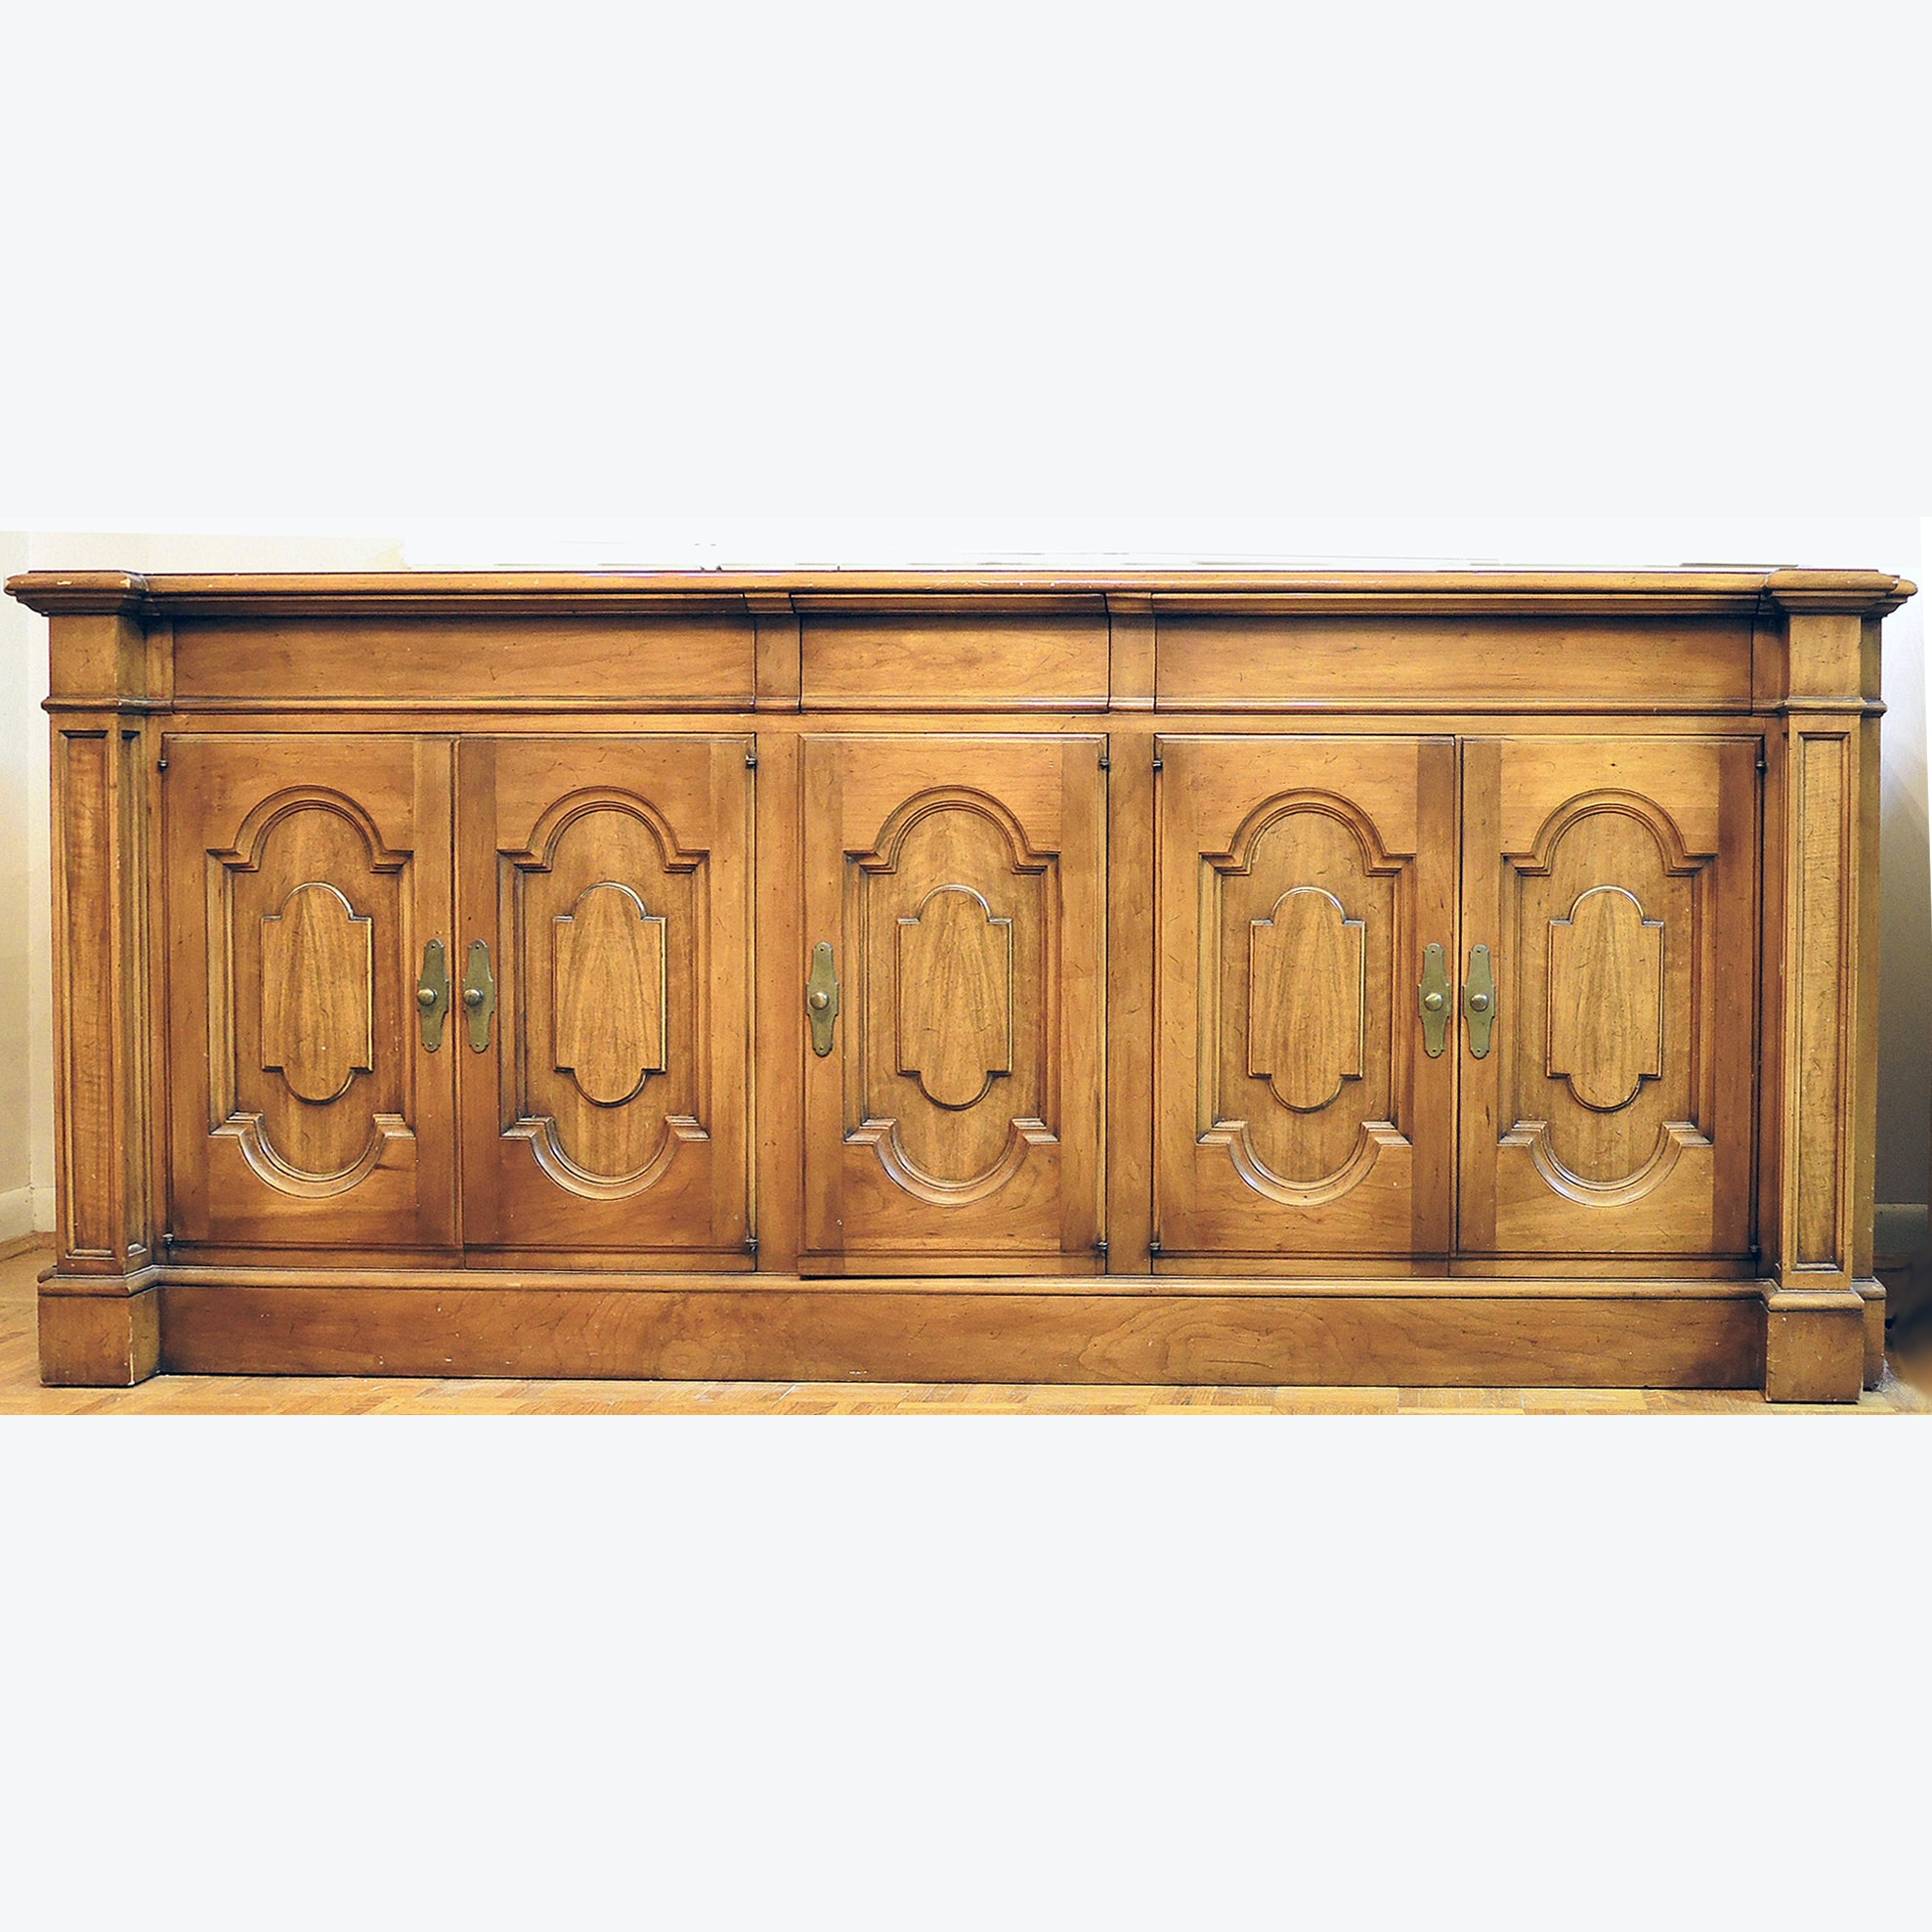 Mediterranean-Style Sideboard by John Widdicomb Furniture